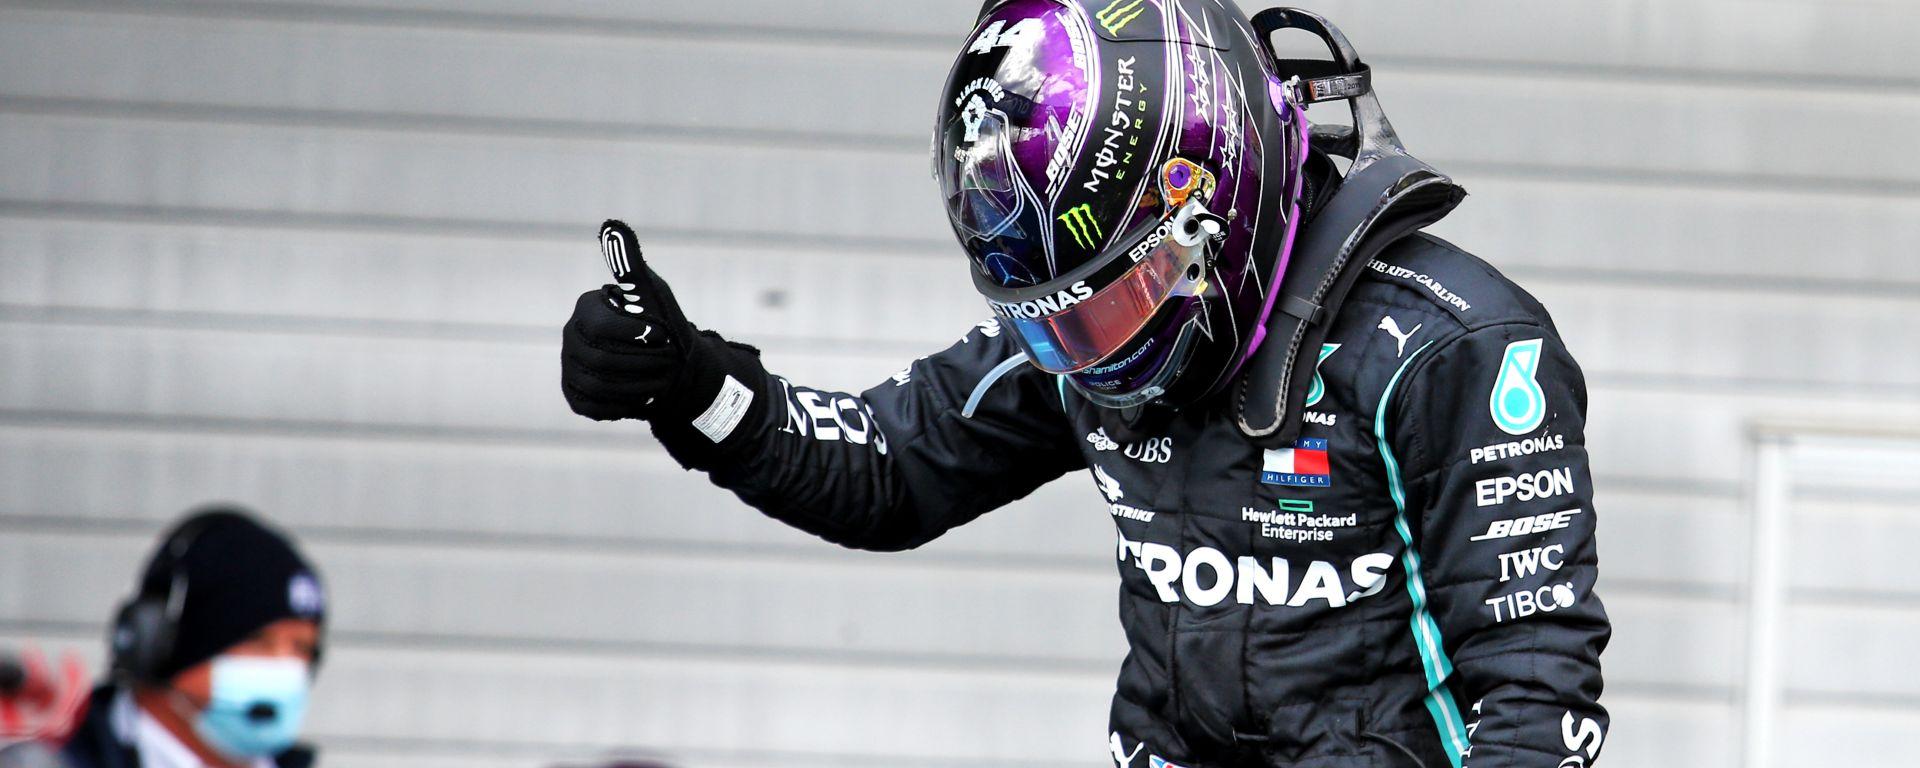 F1, GP Eifel 2020: Lewis Hamilton (Mercedes) festeggia la 91esima vittoria in carriera